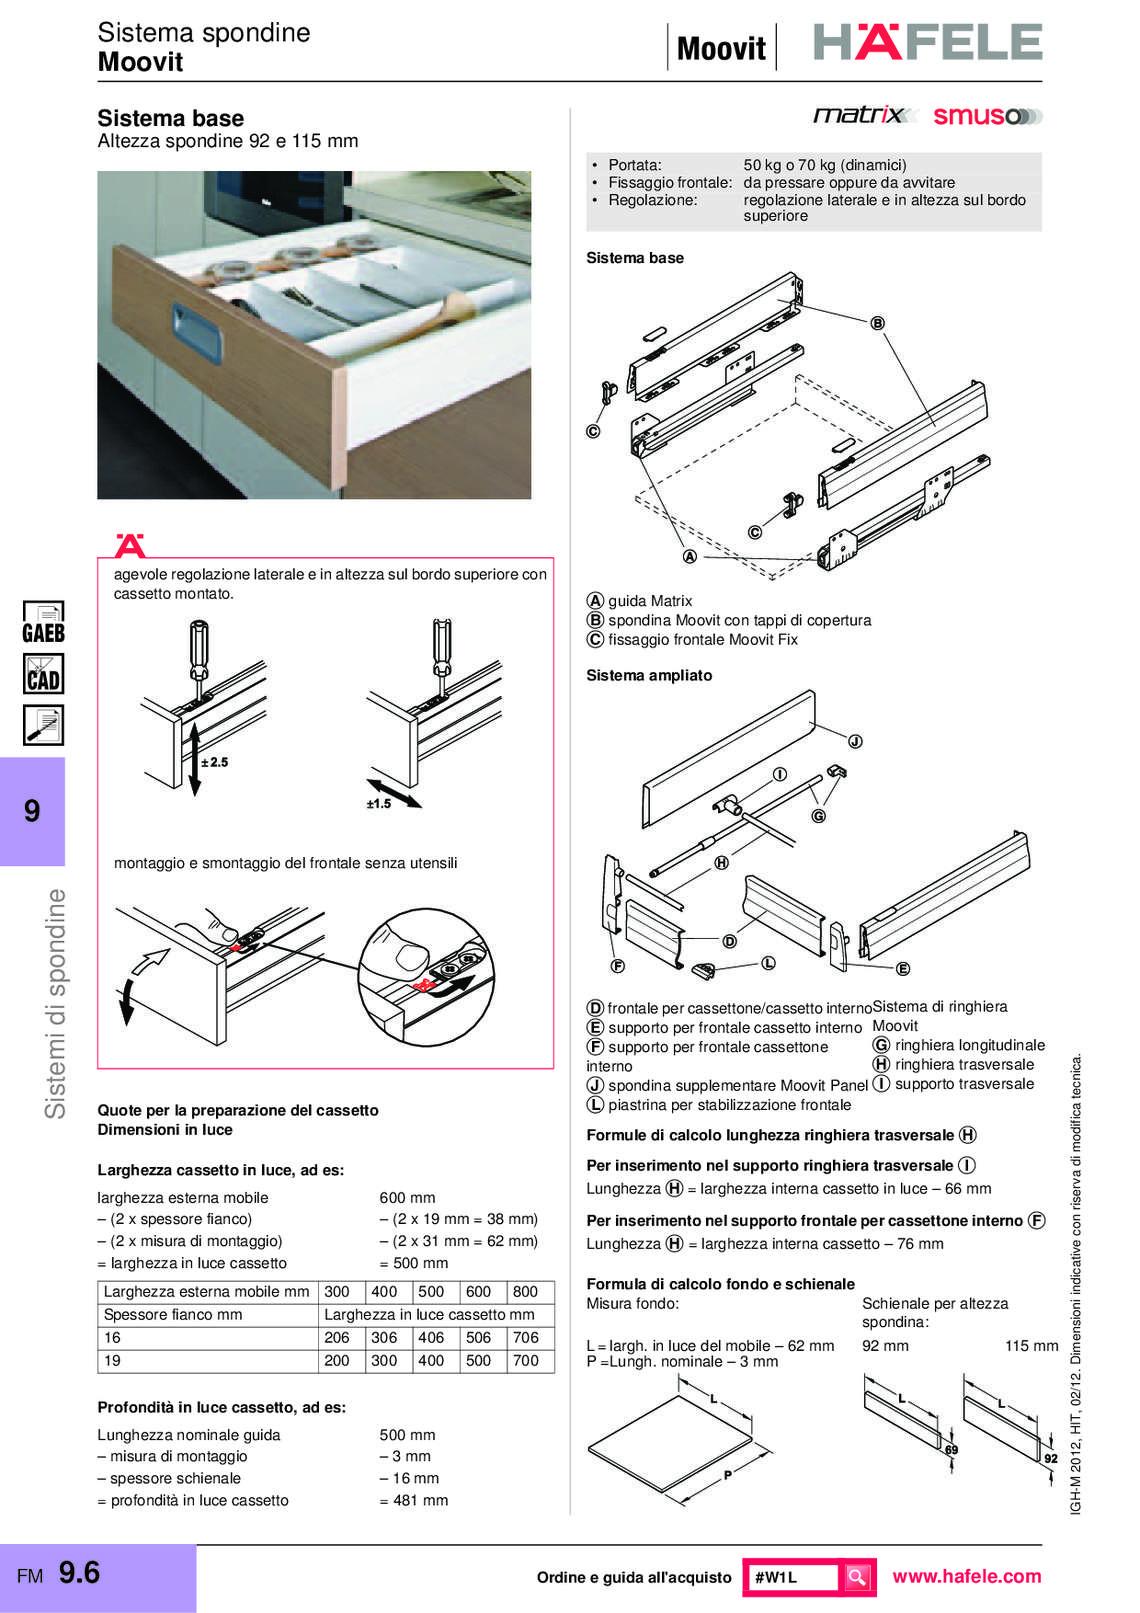 hafele-spondine-e-guide-per-mobili_40_015.jpg